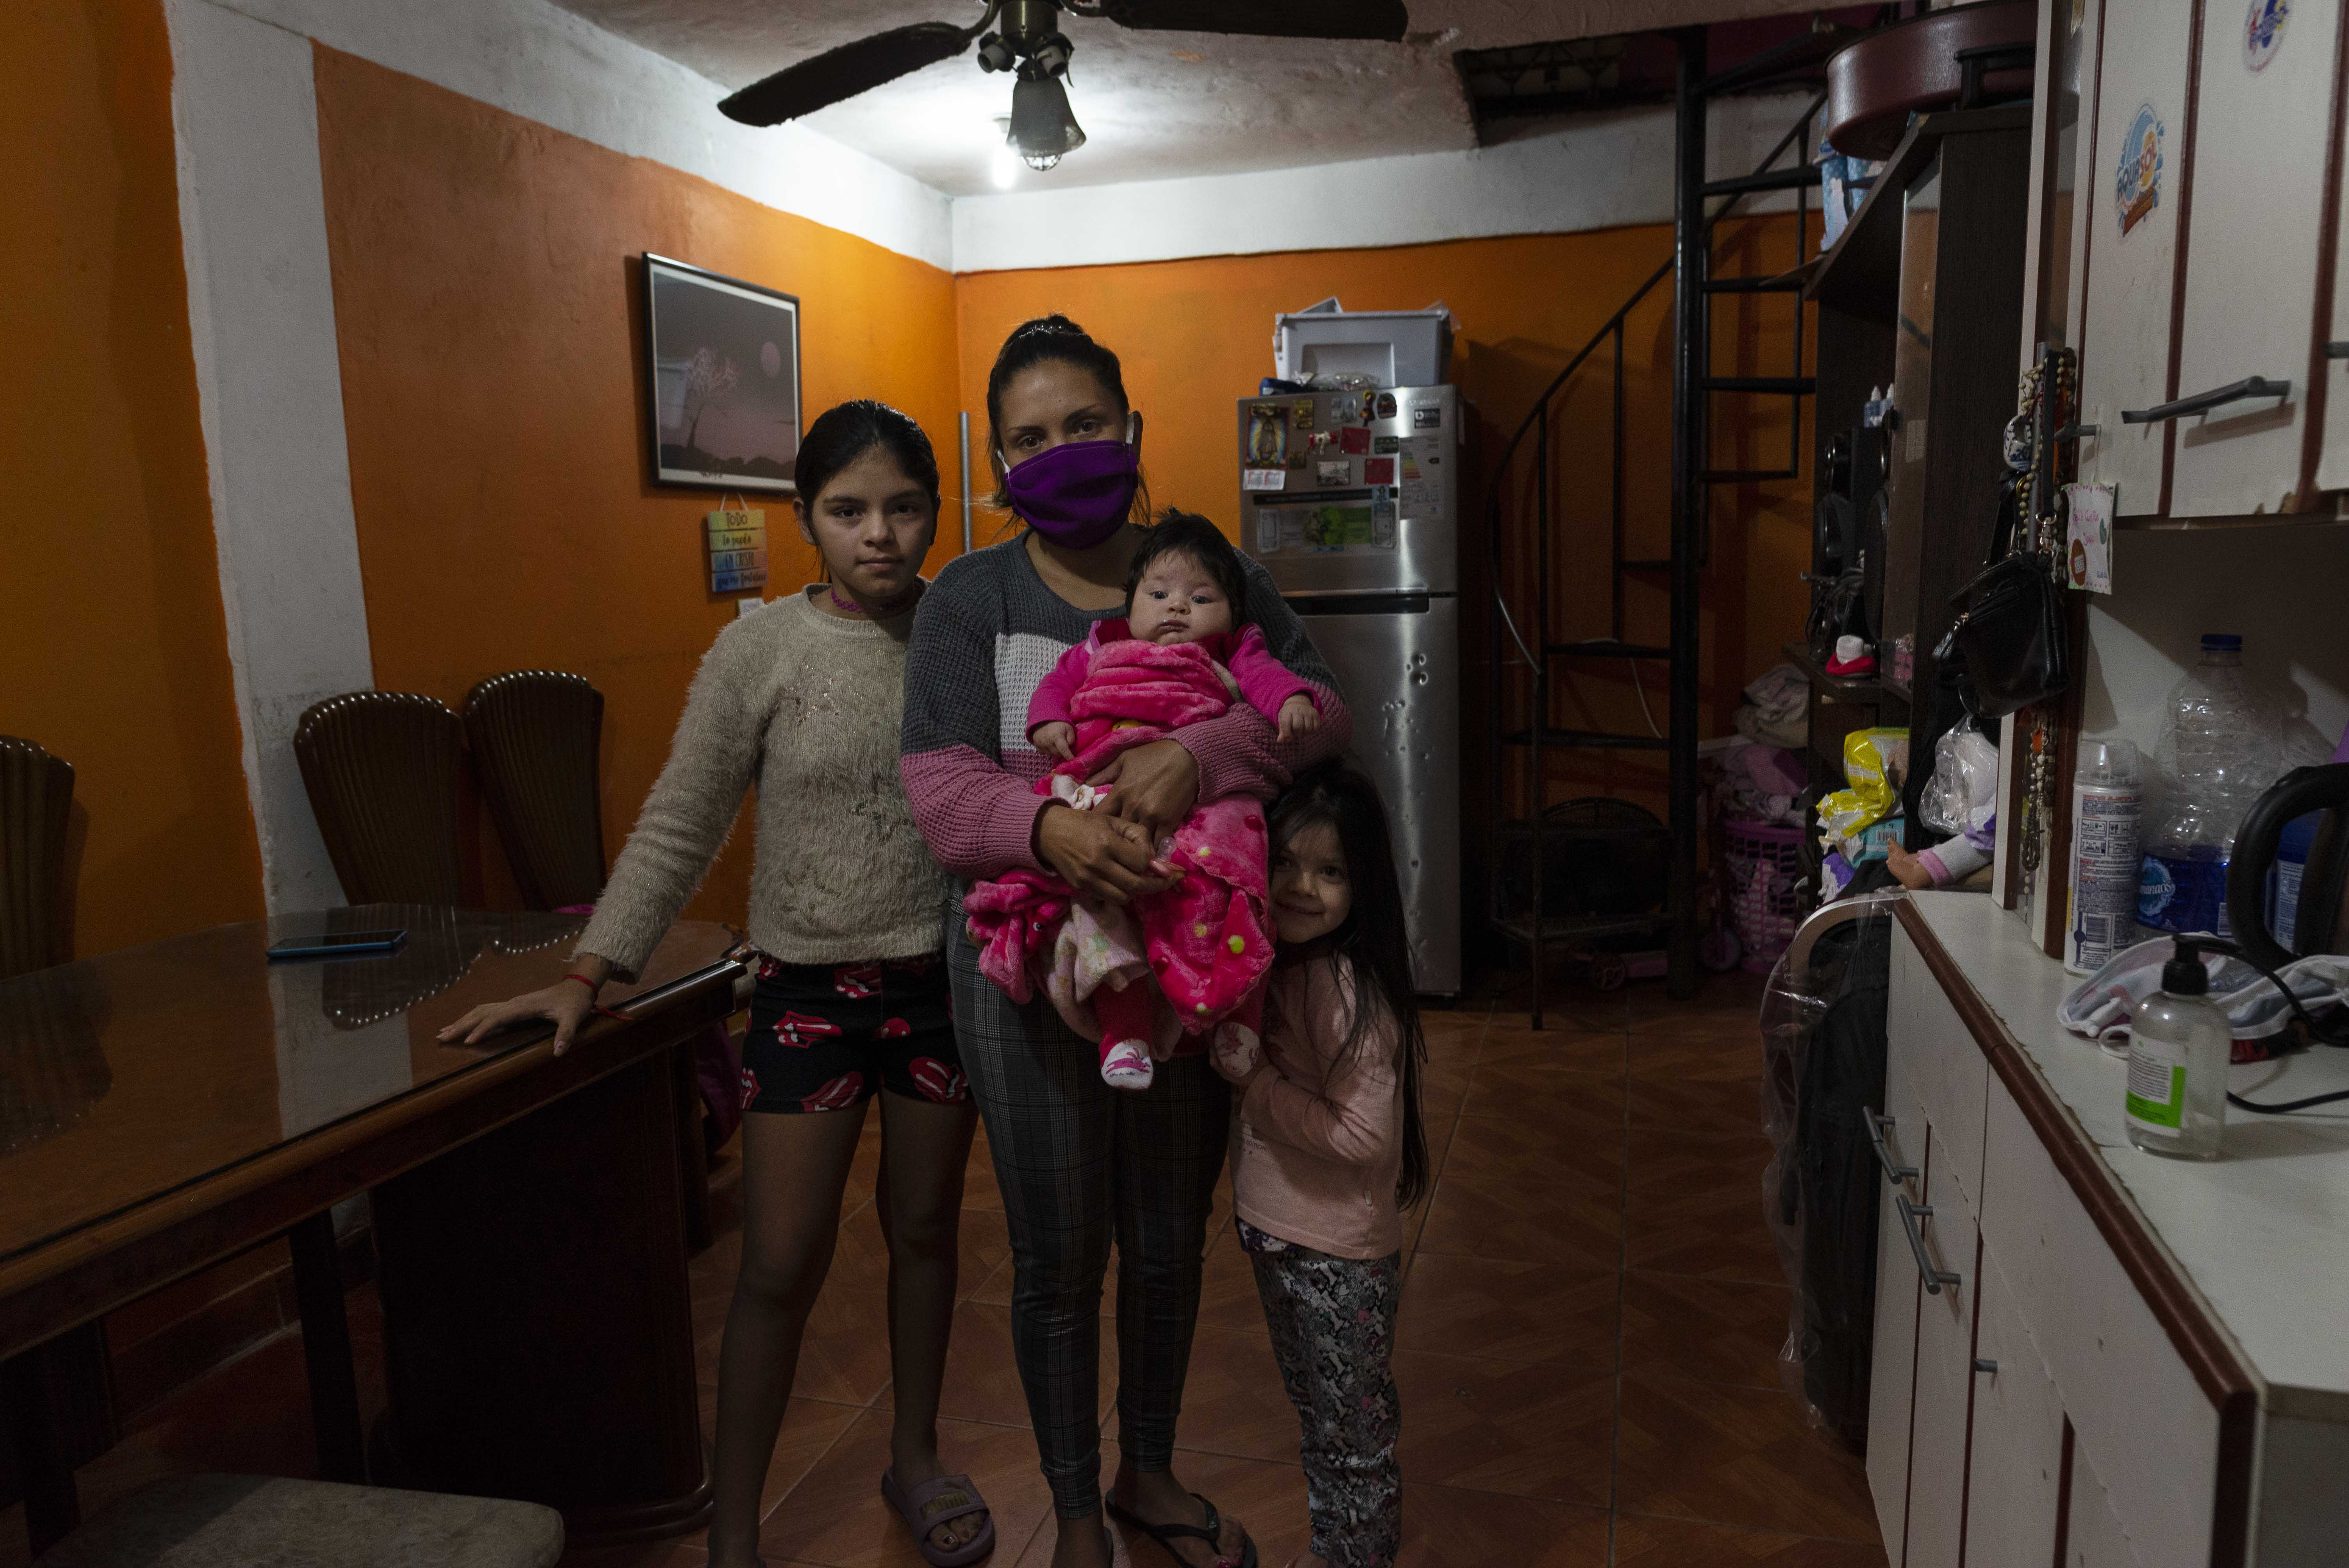 Sobreviviendo a la pandemia sin agua en la villa 31, Magalí Druscovich